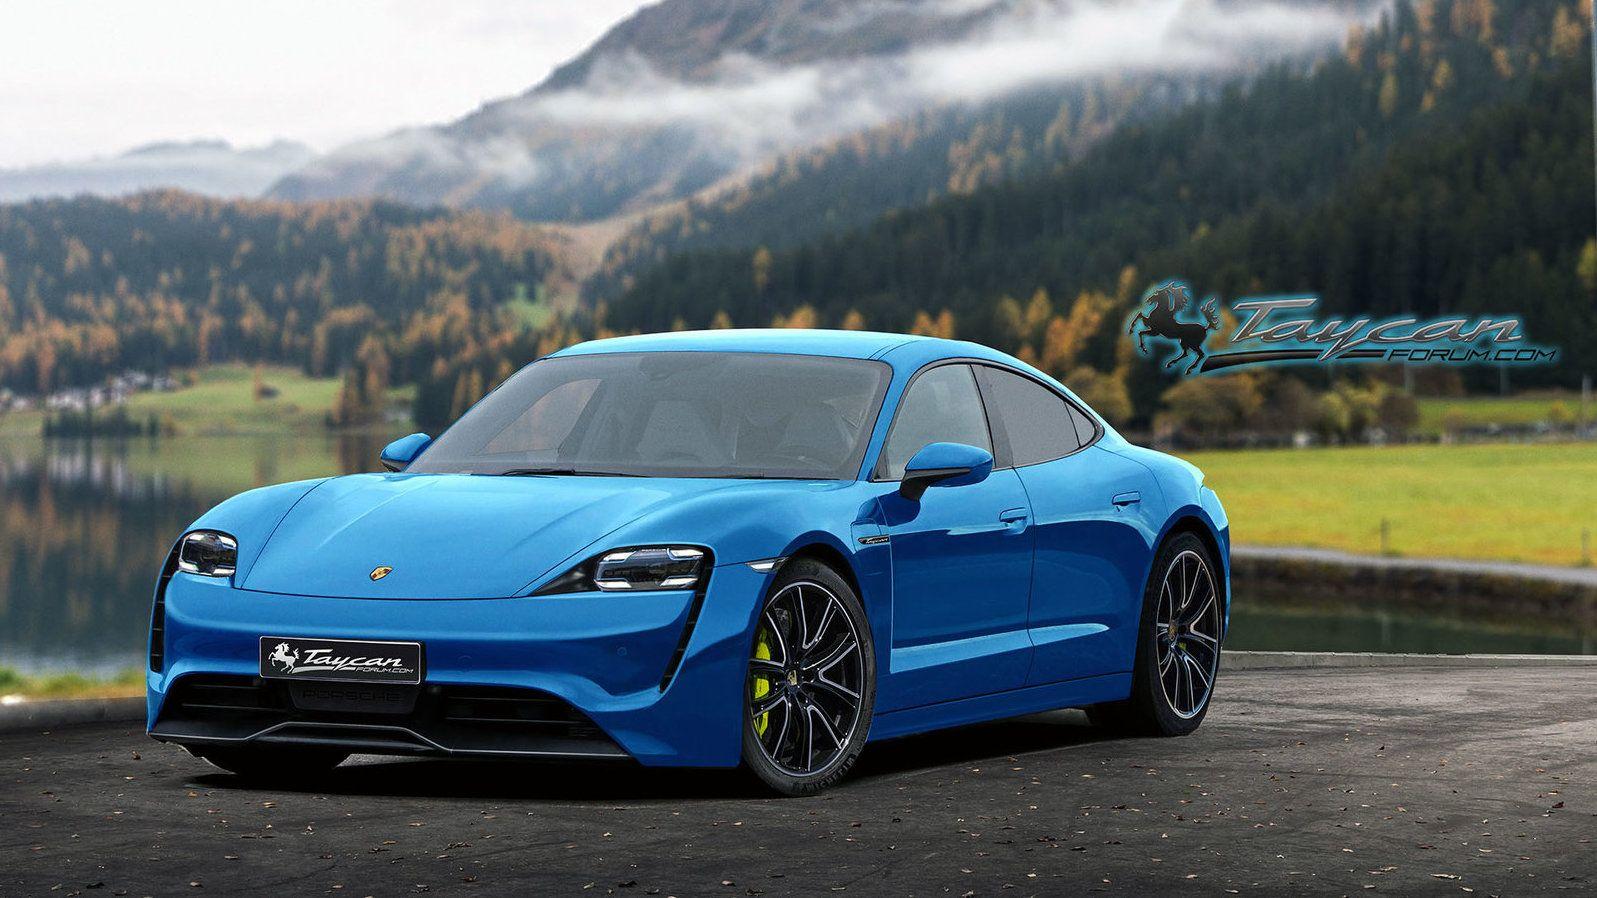 2020 Porsche Taycan EV Porsche taycan, Porsche, Concept cars